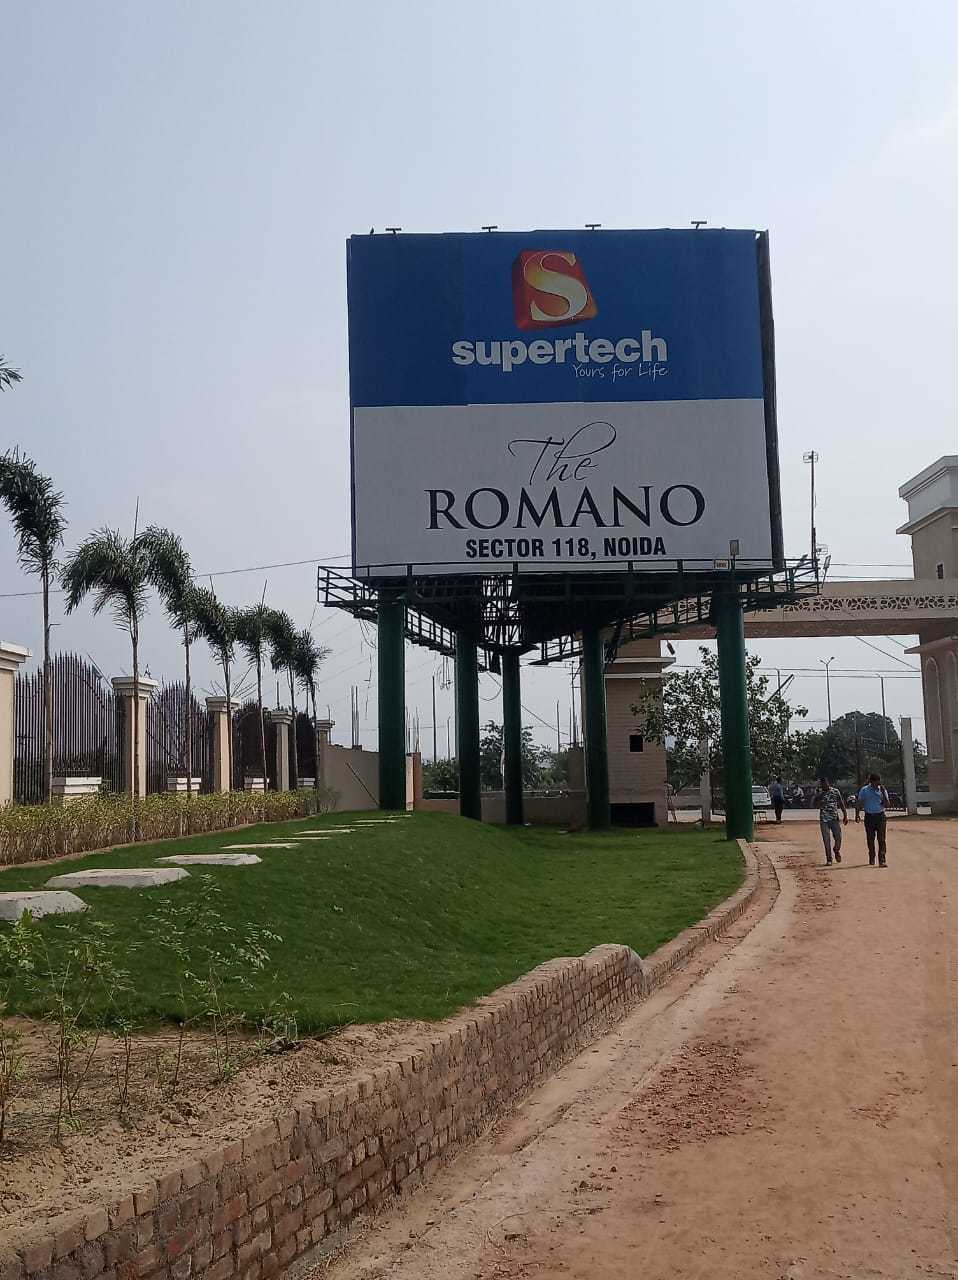 Supertech romano